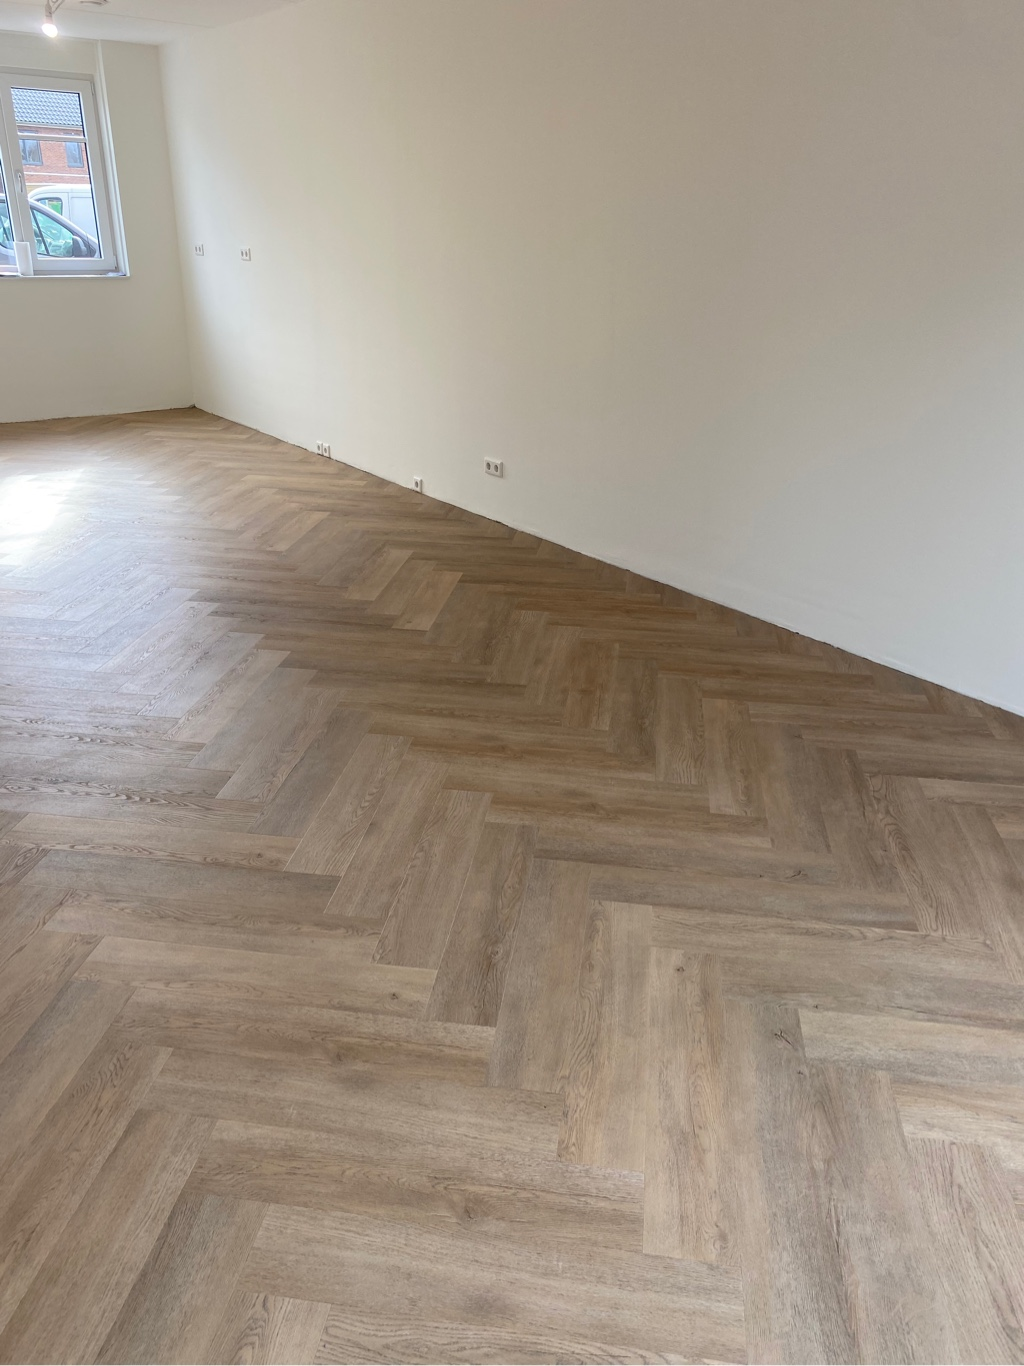 105 m² Belakos Visgraat XL71  Plak-pvc